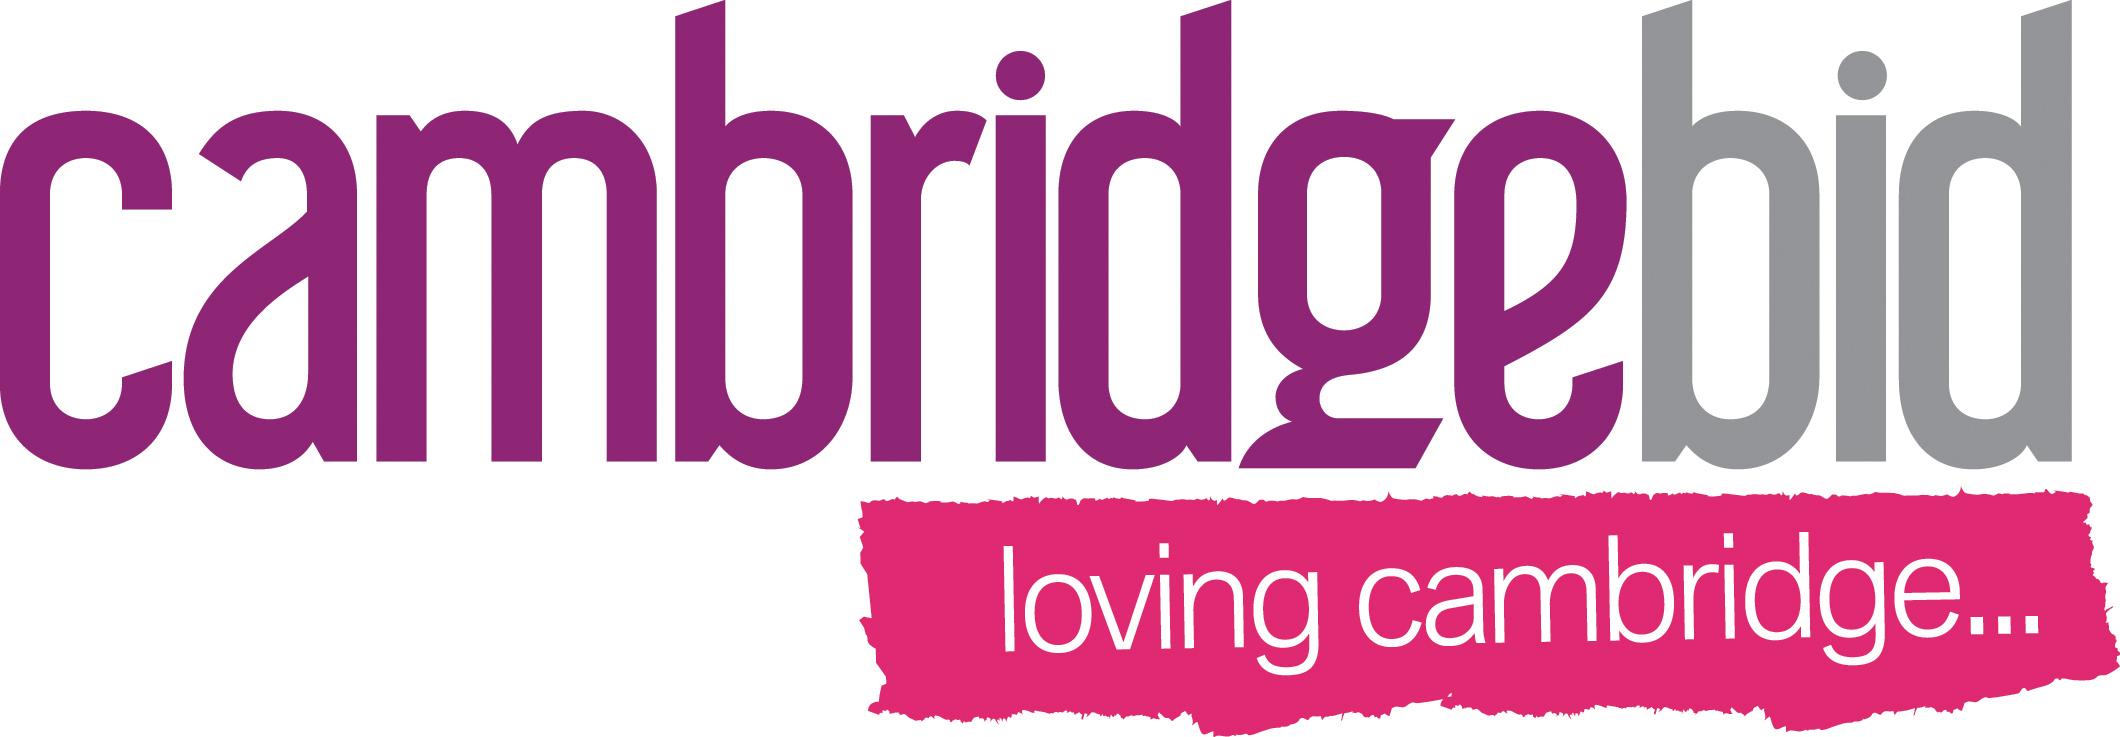 Primary Cambridgebid logo (RGB).jpg